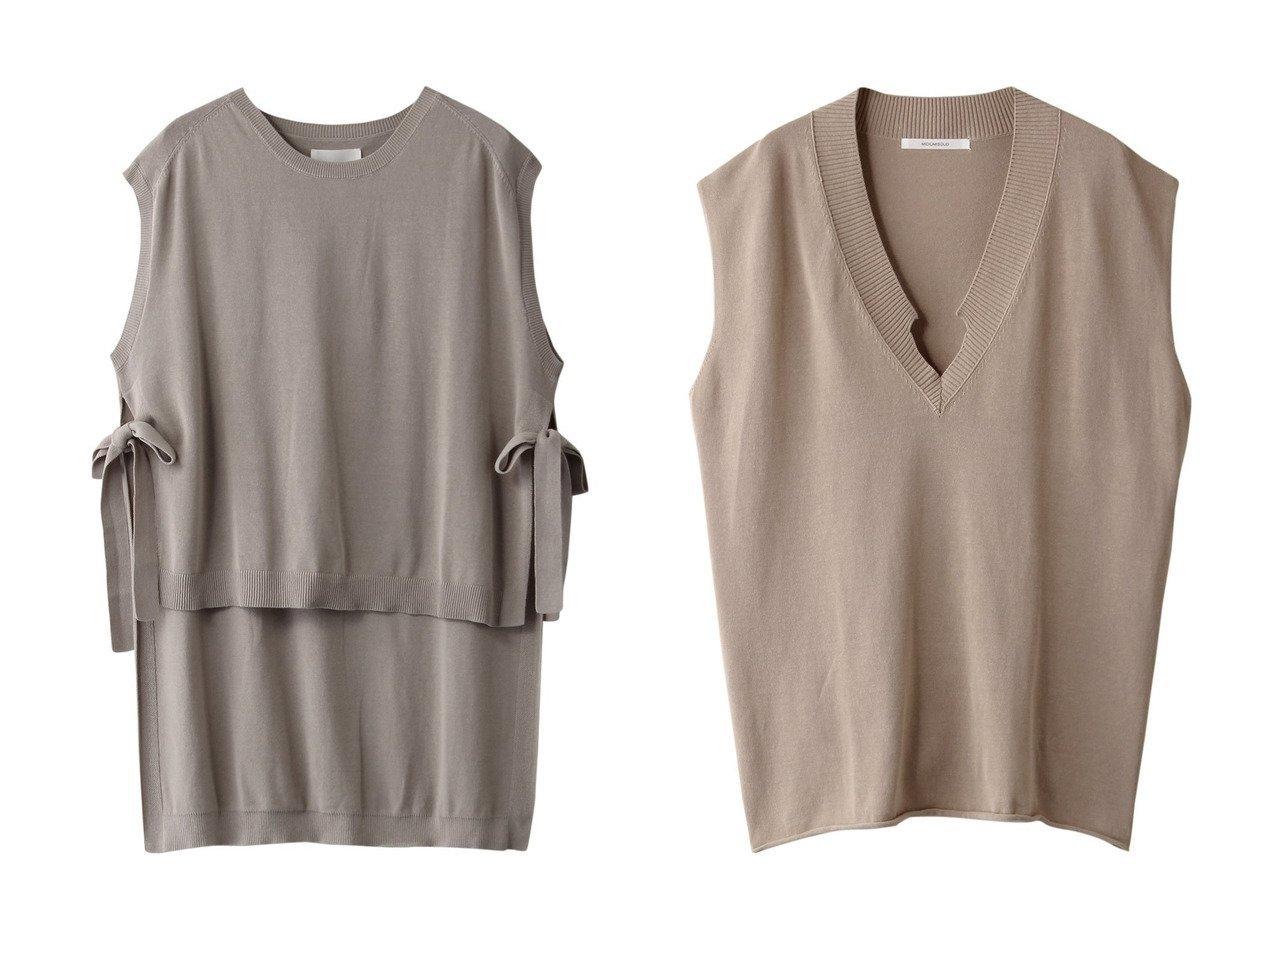 【MIDIUMISOLID/ミディウミソリッド】のdeformed V neck vest&side slit wide vest 【トップス・カットソー】おすすめ!人気、トレンド・レディースファッションの通販  おすすめで人気の流行・トレンド、ファッションの通販商品 メンズファッション・キッズファッション・インテリア・家具・レディースファッション・服の通販 founy(ファニー) https://founy.com/ ファッション Fashion レディースファッション WOMEN トップス・カットソー Tops/Tshirt ニット Knit Tops ベスト/ジレ Gilets/Vests プルオーバー Pullover 2021年 2021 2021春夏・S/S SS/Spring/Summer/2021 S/S・春夏 SS・Spring/Summer スリット ベスト リボン 春 Spring |ID:crp329100000026526